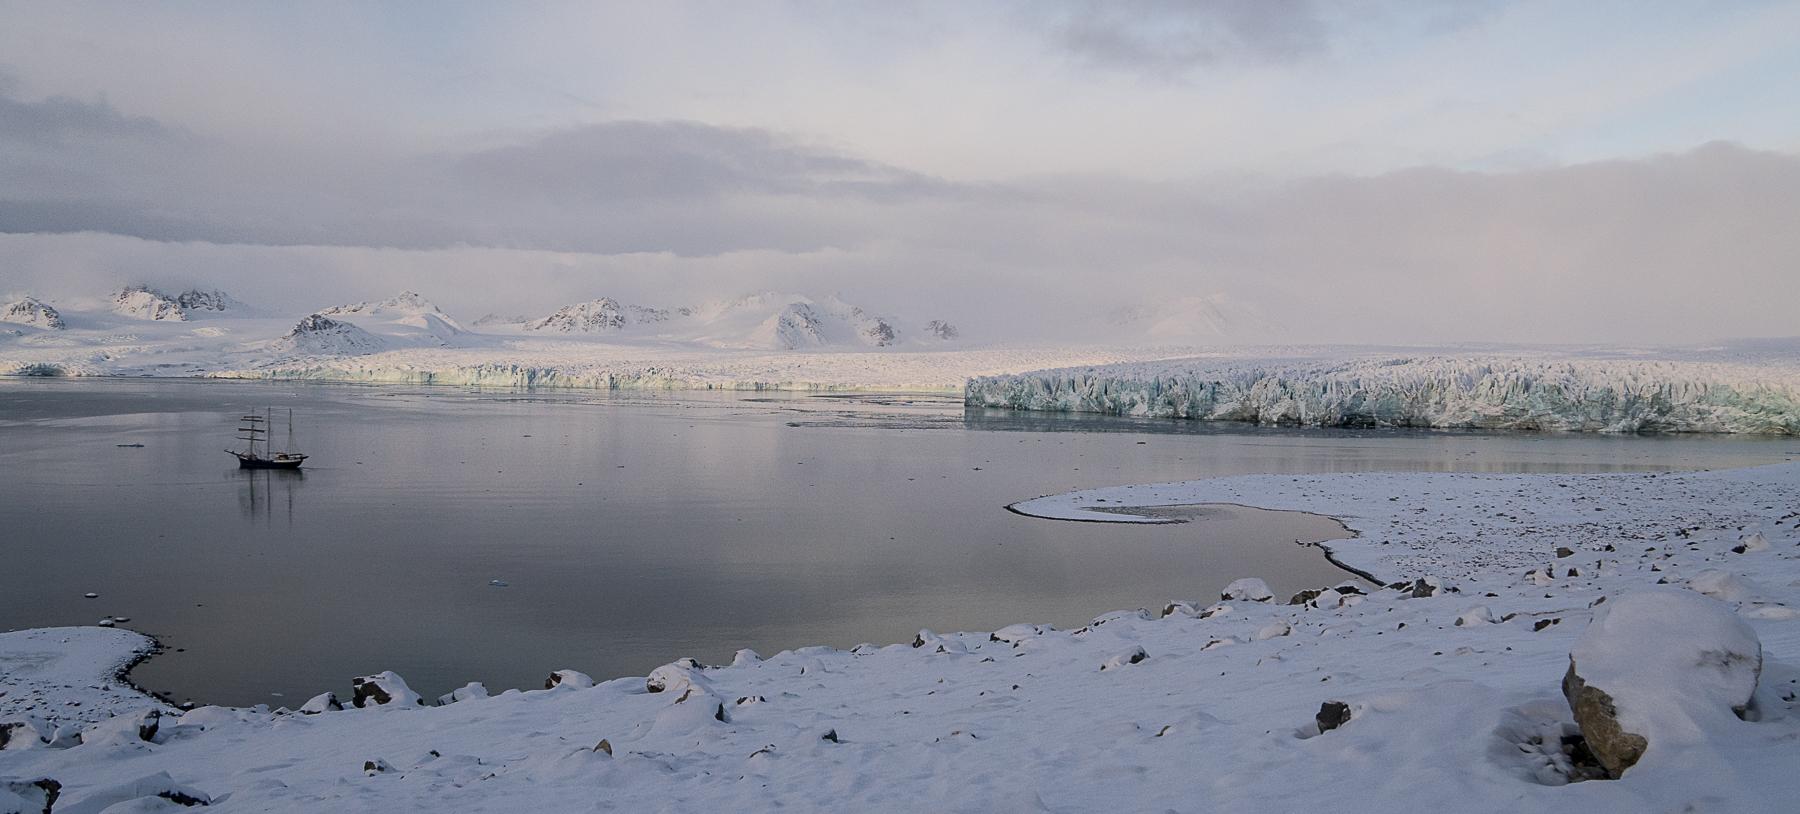 Alaska, Lilliehöökbreen, Möllerfjorden, Krossfjorden, Antigua, Arctic, Arctic Ocean, autumn, climate change, coal, Esmarkbreen, glacier, glacier ice, gratitude, H2O, high pressure, hiking, ice, jigsaw, Longyearbyen, low pressure, animals, mine number 2, mines, mining, north wind, Norway, Oslo, pancake ice, perimeter, photography, puzzle, Recherchebreen, Recherchefjorden, Roads, scale, scree, slopes, snow, Spitsbergen, Svalbard, sweater, sync, tall ship, talus, The Arctic Circle, travel, walkabout, water, west, winter, words, world, Ymerbukta